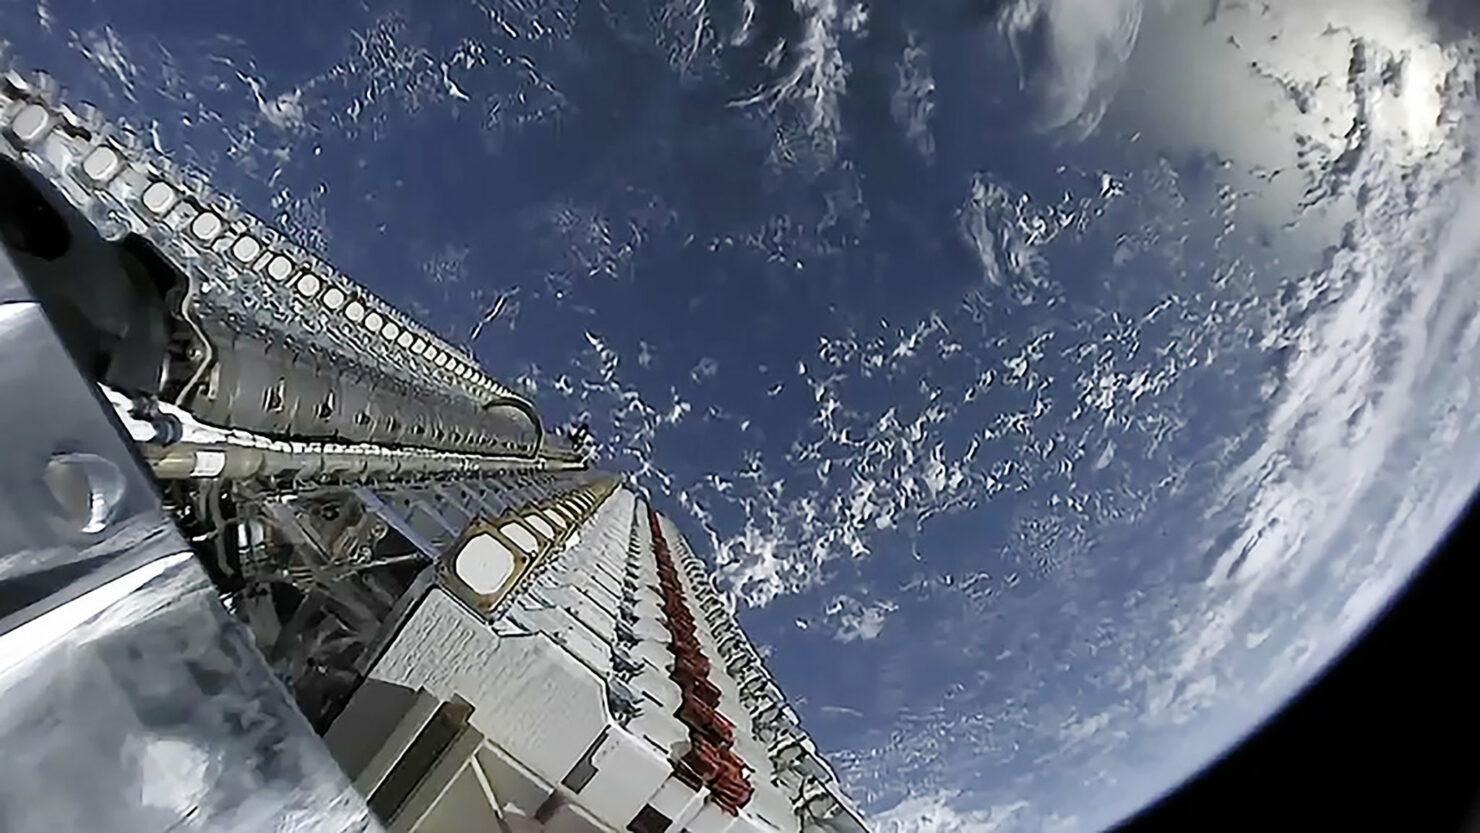 Starlink satellites in space